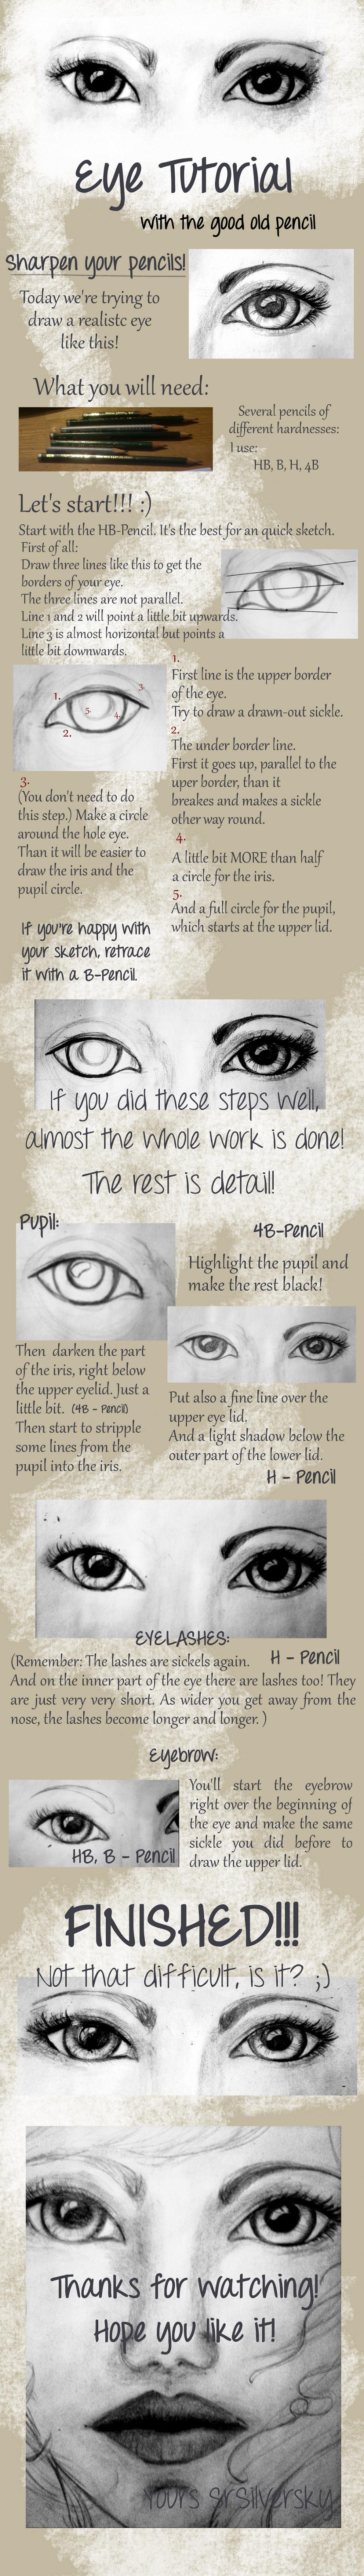 How to draw... a realistic Eye? by SrSilversky